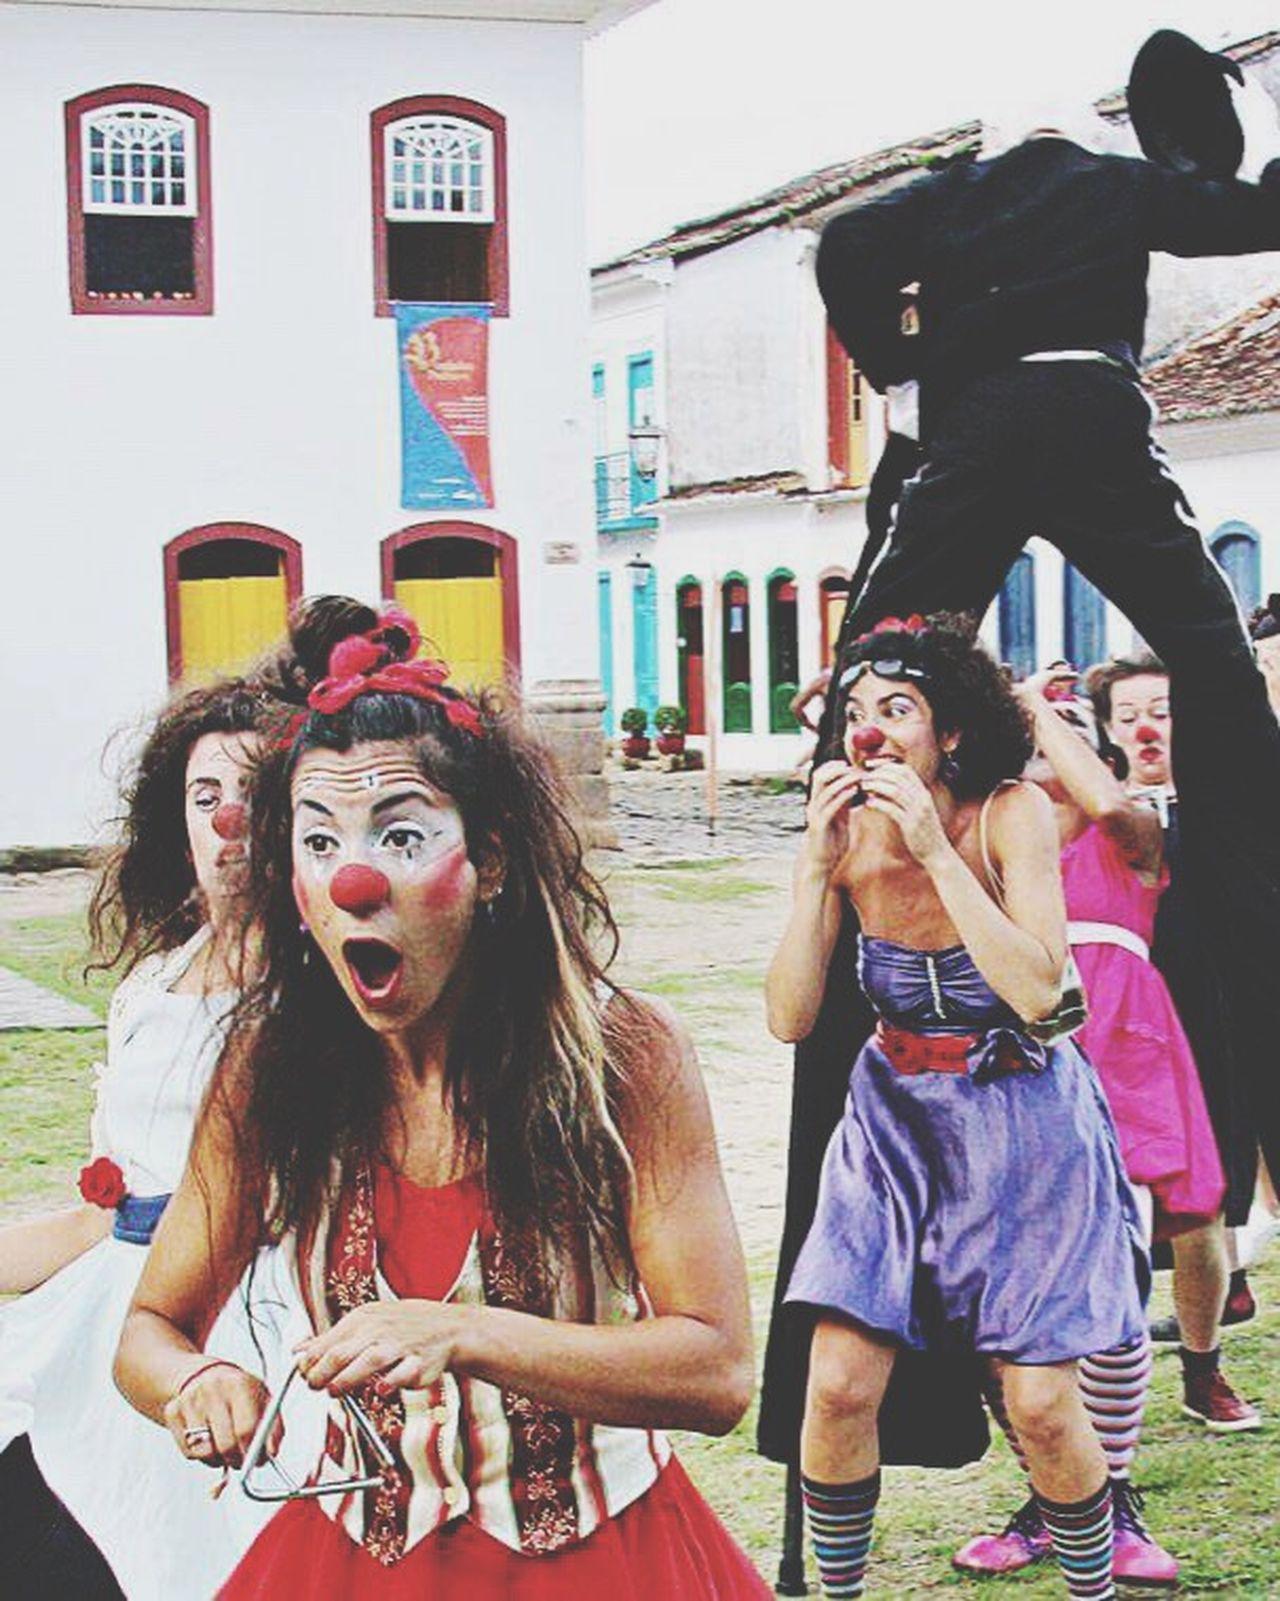 Women Around The World Makesmesmile Clown Girls Journey Women Togetherness Fun Enjoying Life Enjoying The Moment Joker Act Comedy Happy